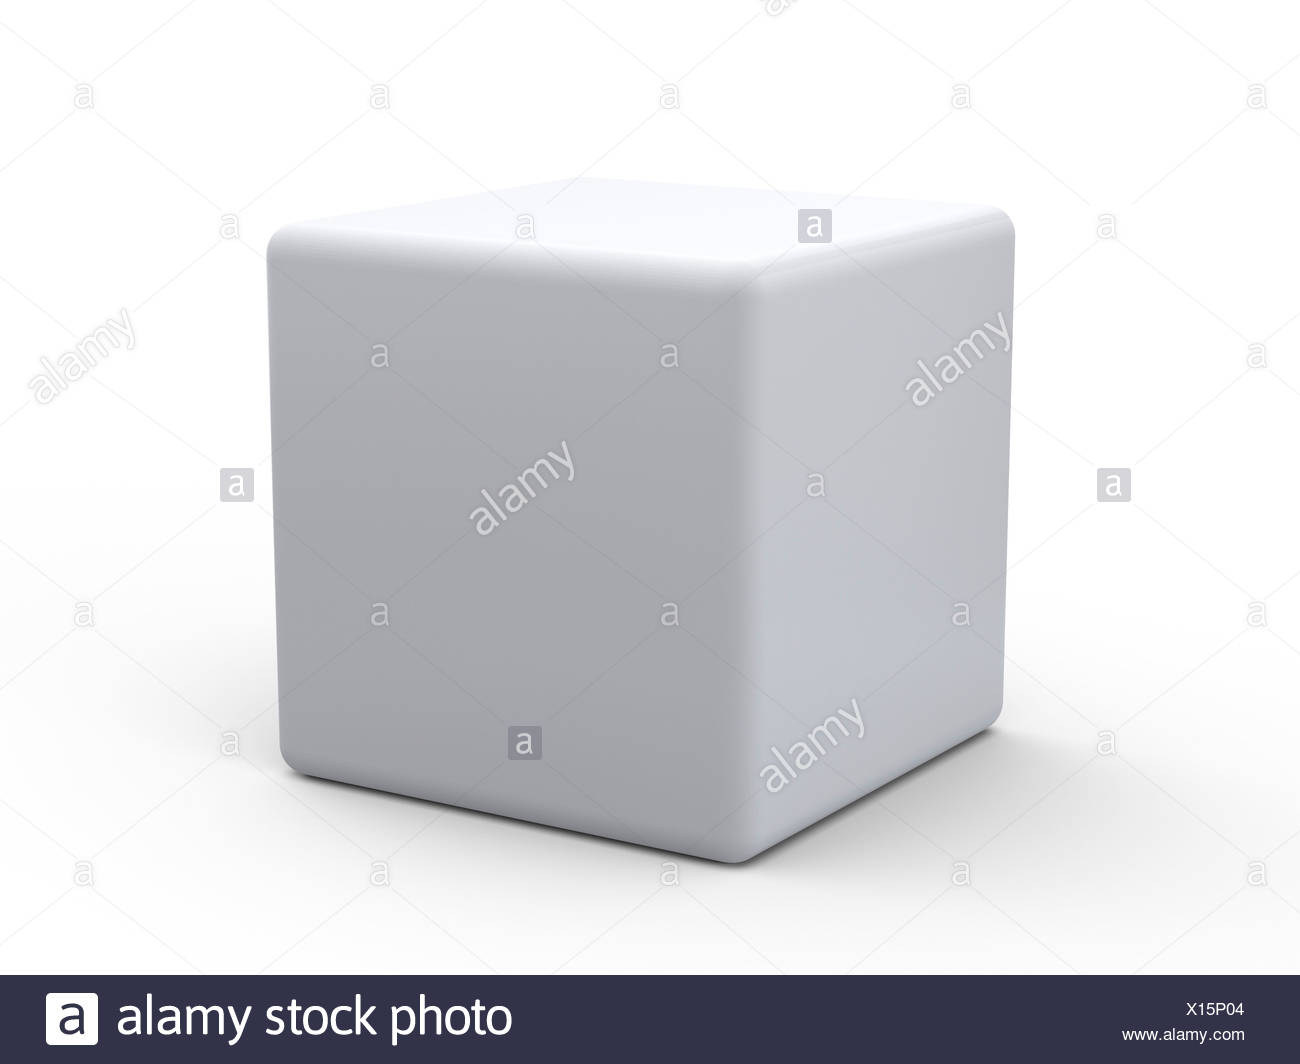 White cube, artwork - Stock Image